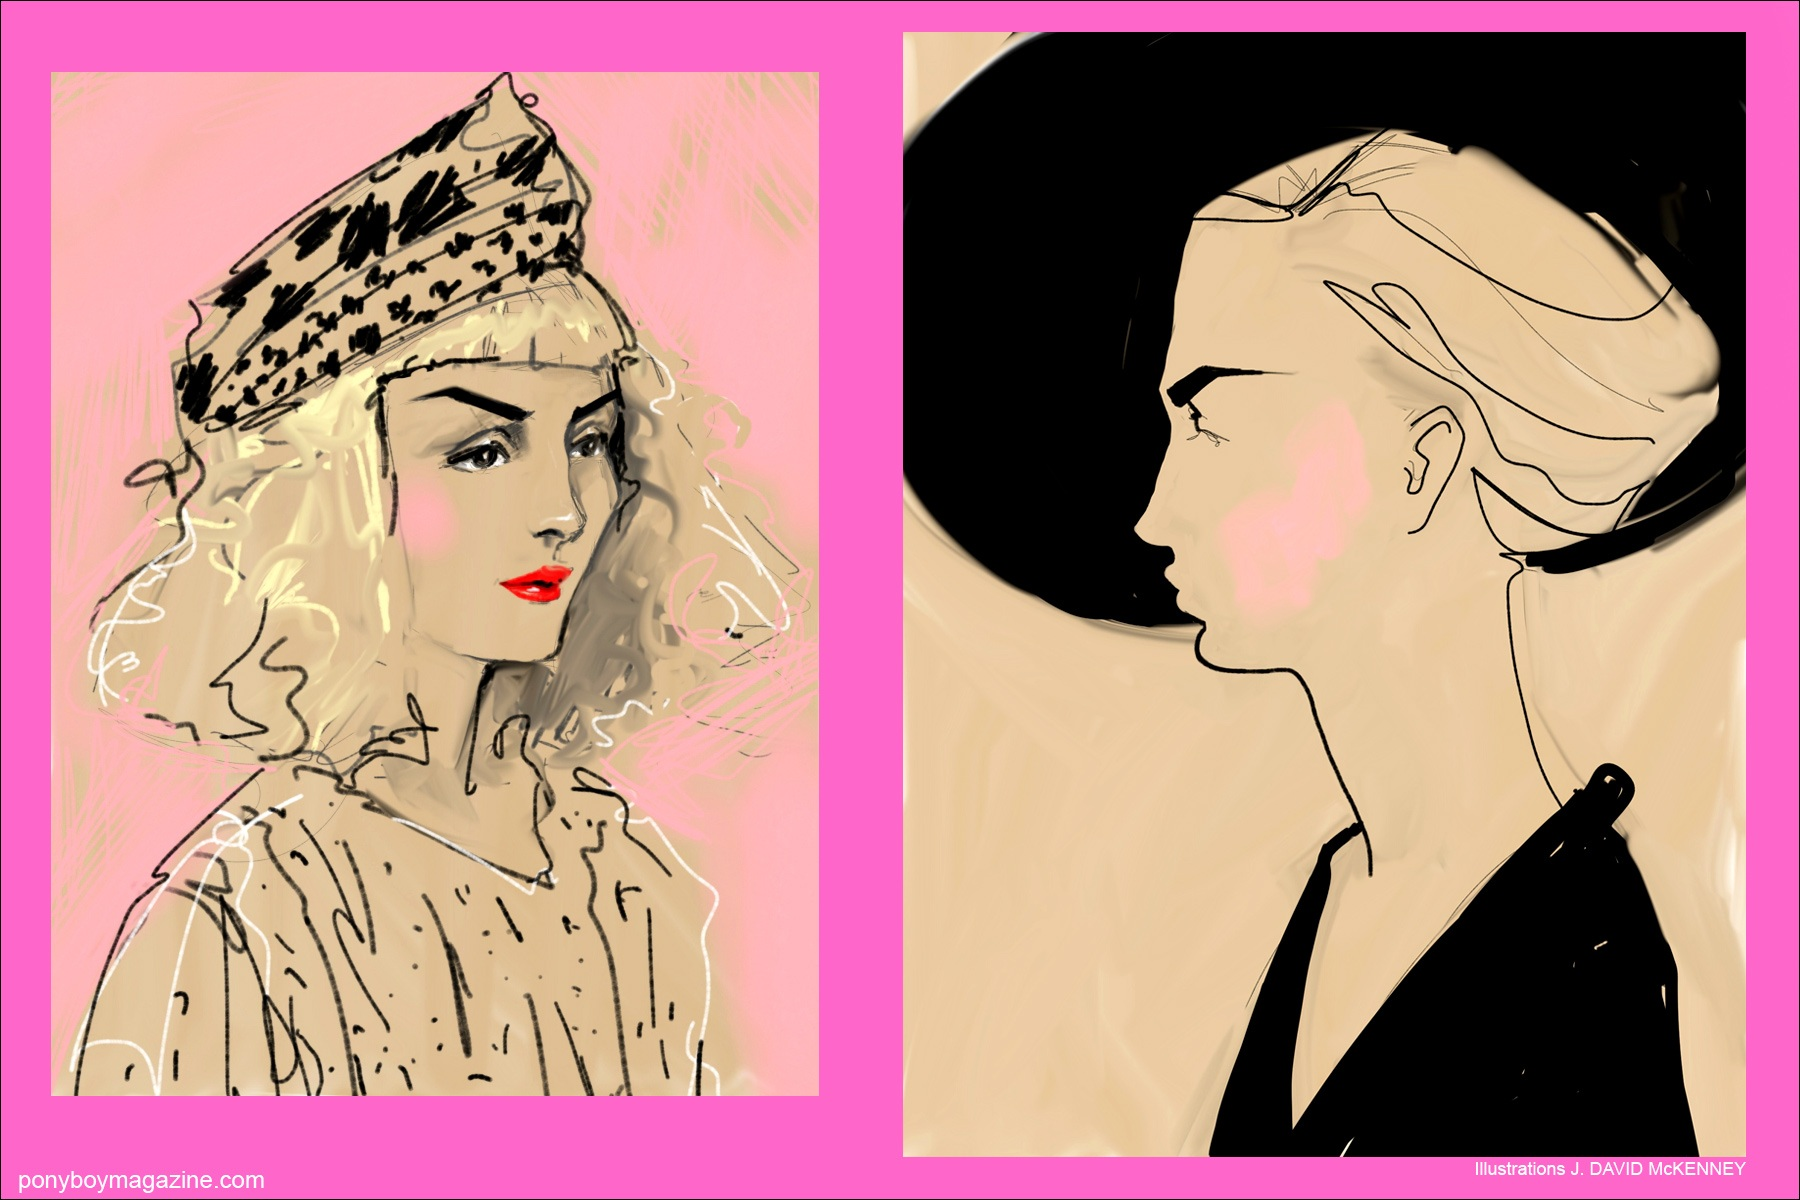 Illustrations of New York City model Stella Rose Saint Clair for Ponyboy Magazine.